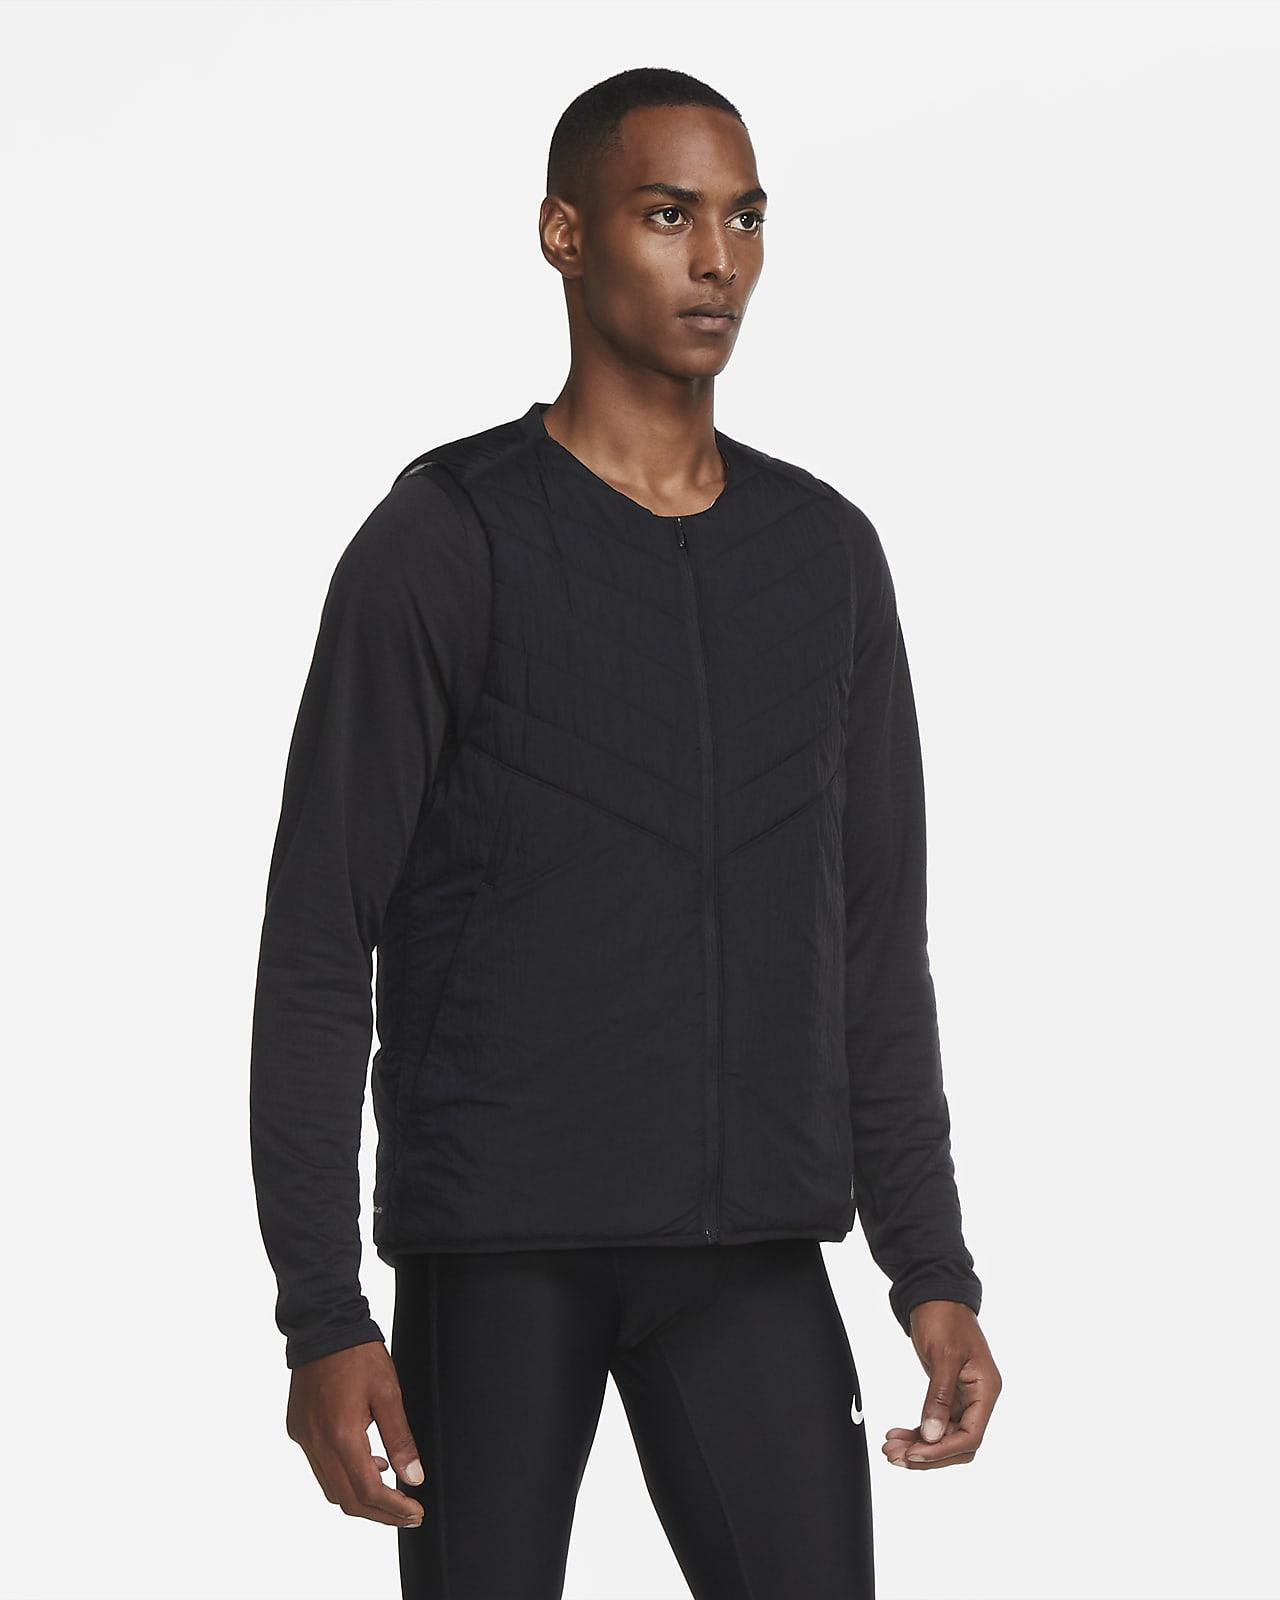 Nike Aerolayer Men's Running Vest